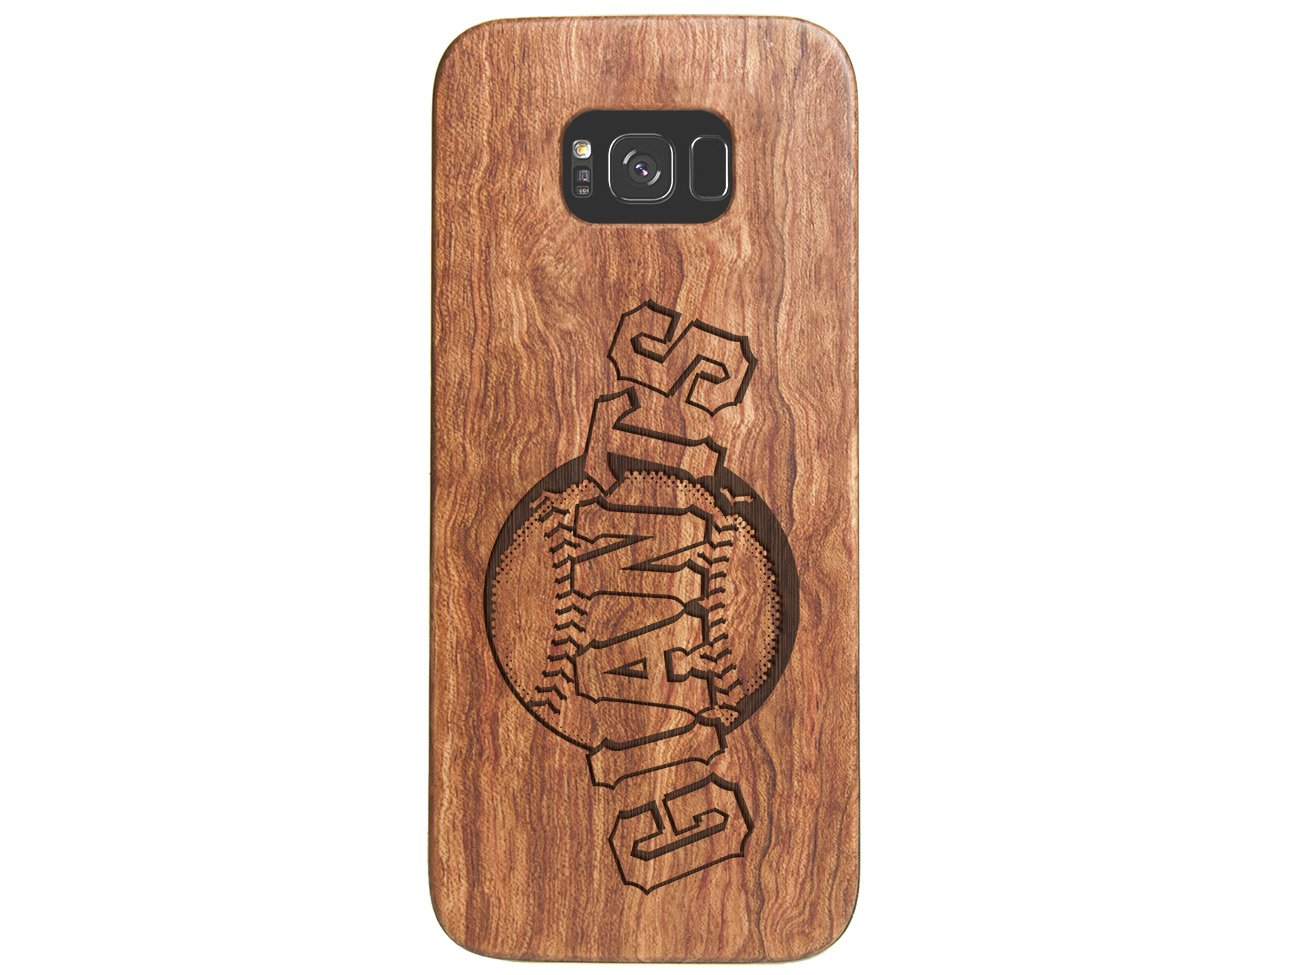 San Francisco Giants Iphone  Case